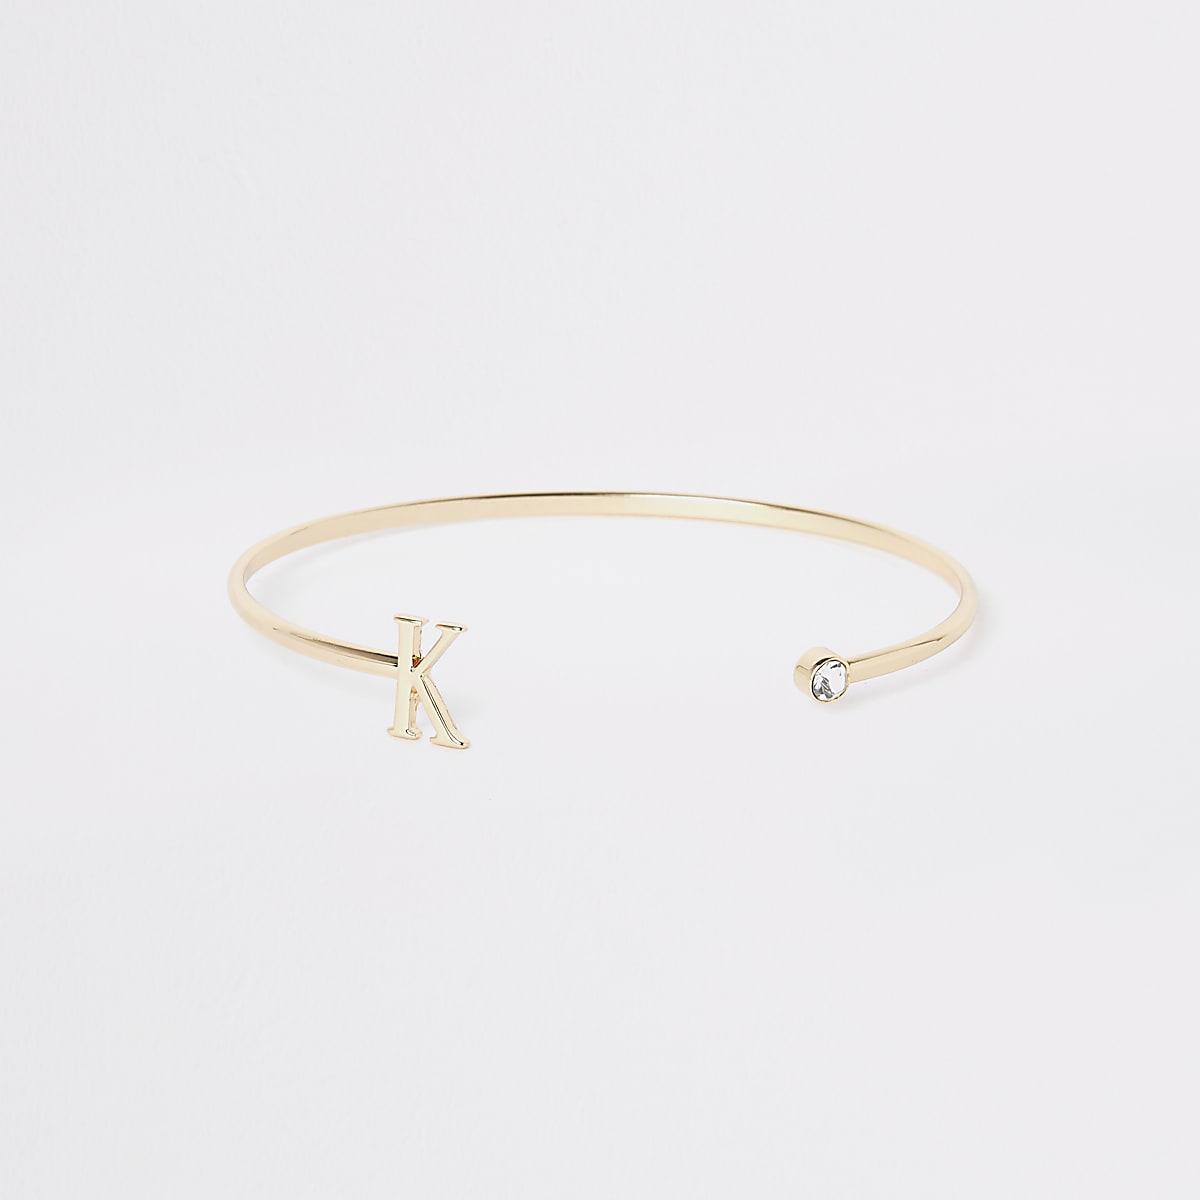 Gold plated 'K' initial cuff bracelet